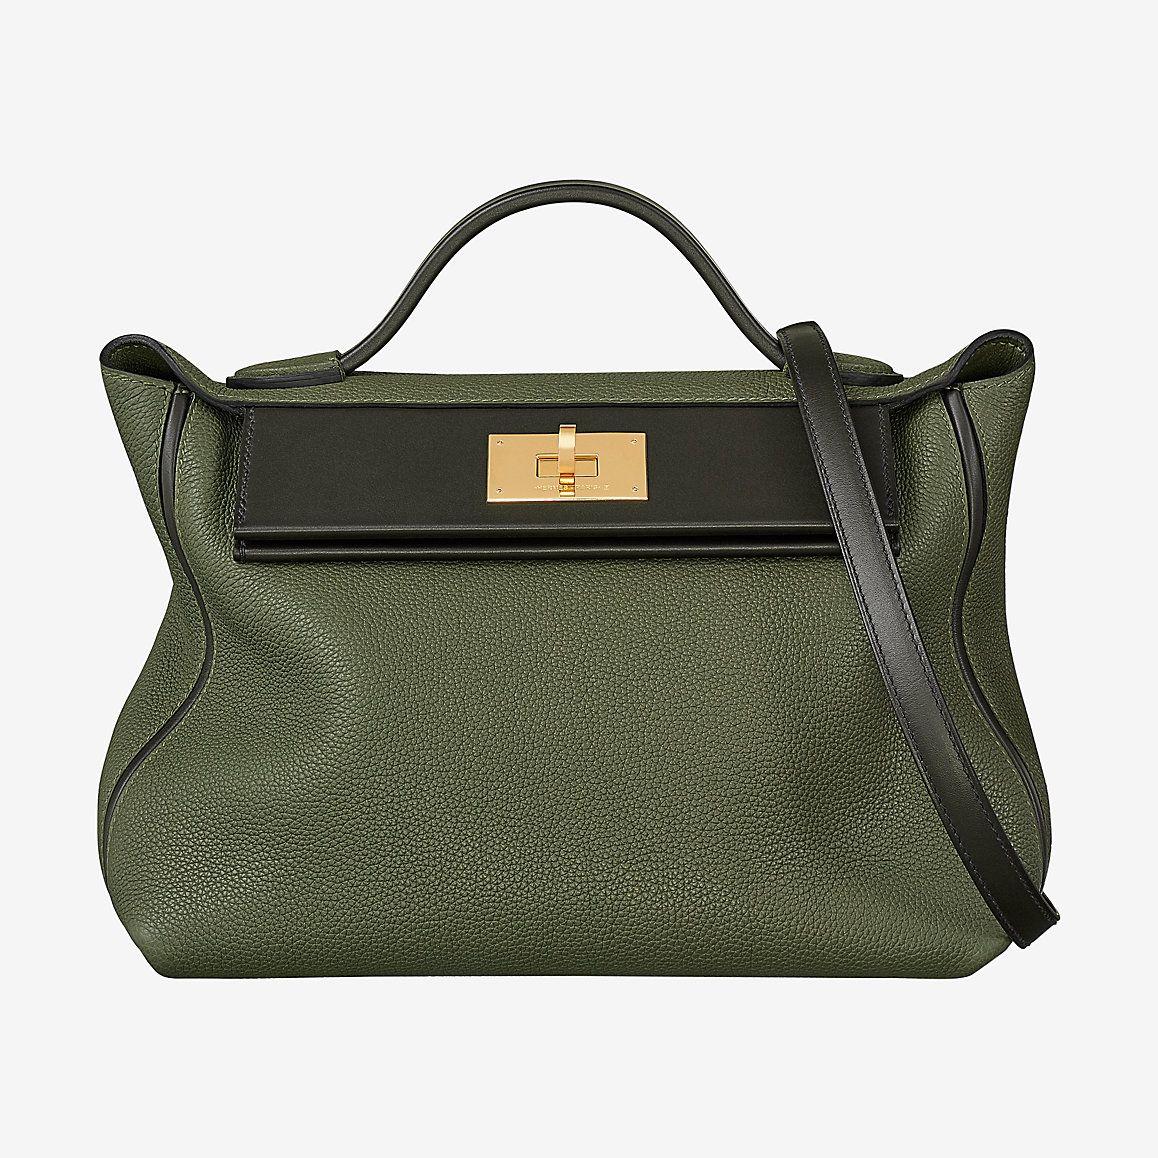 7c880ab1ad1c 24 24 29cm in Vert Olive Vert Bronze Taurillon Maurice and Barenia Calfskin  GHW  2424  hermes2424  handbag  bag  vertolive  vertbronze  rarebag   rarecolor ...